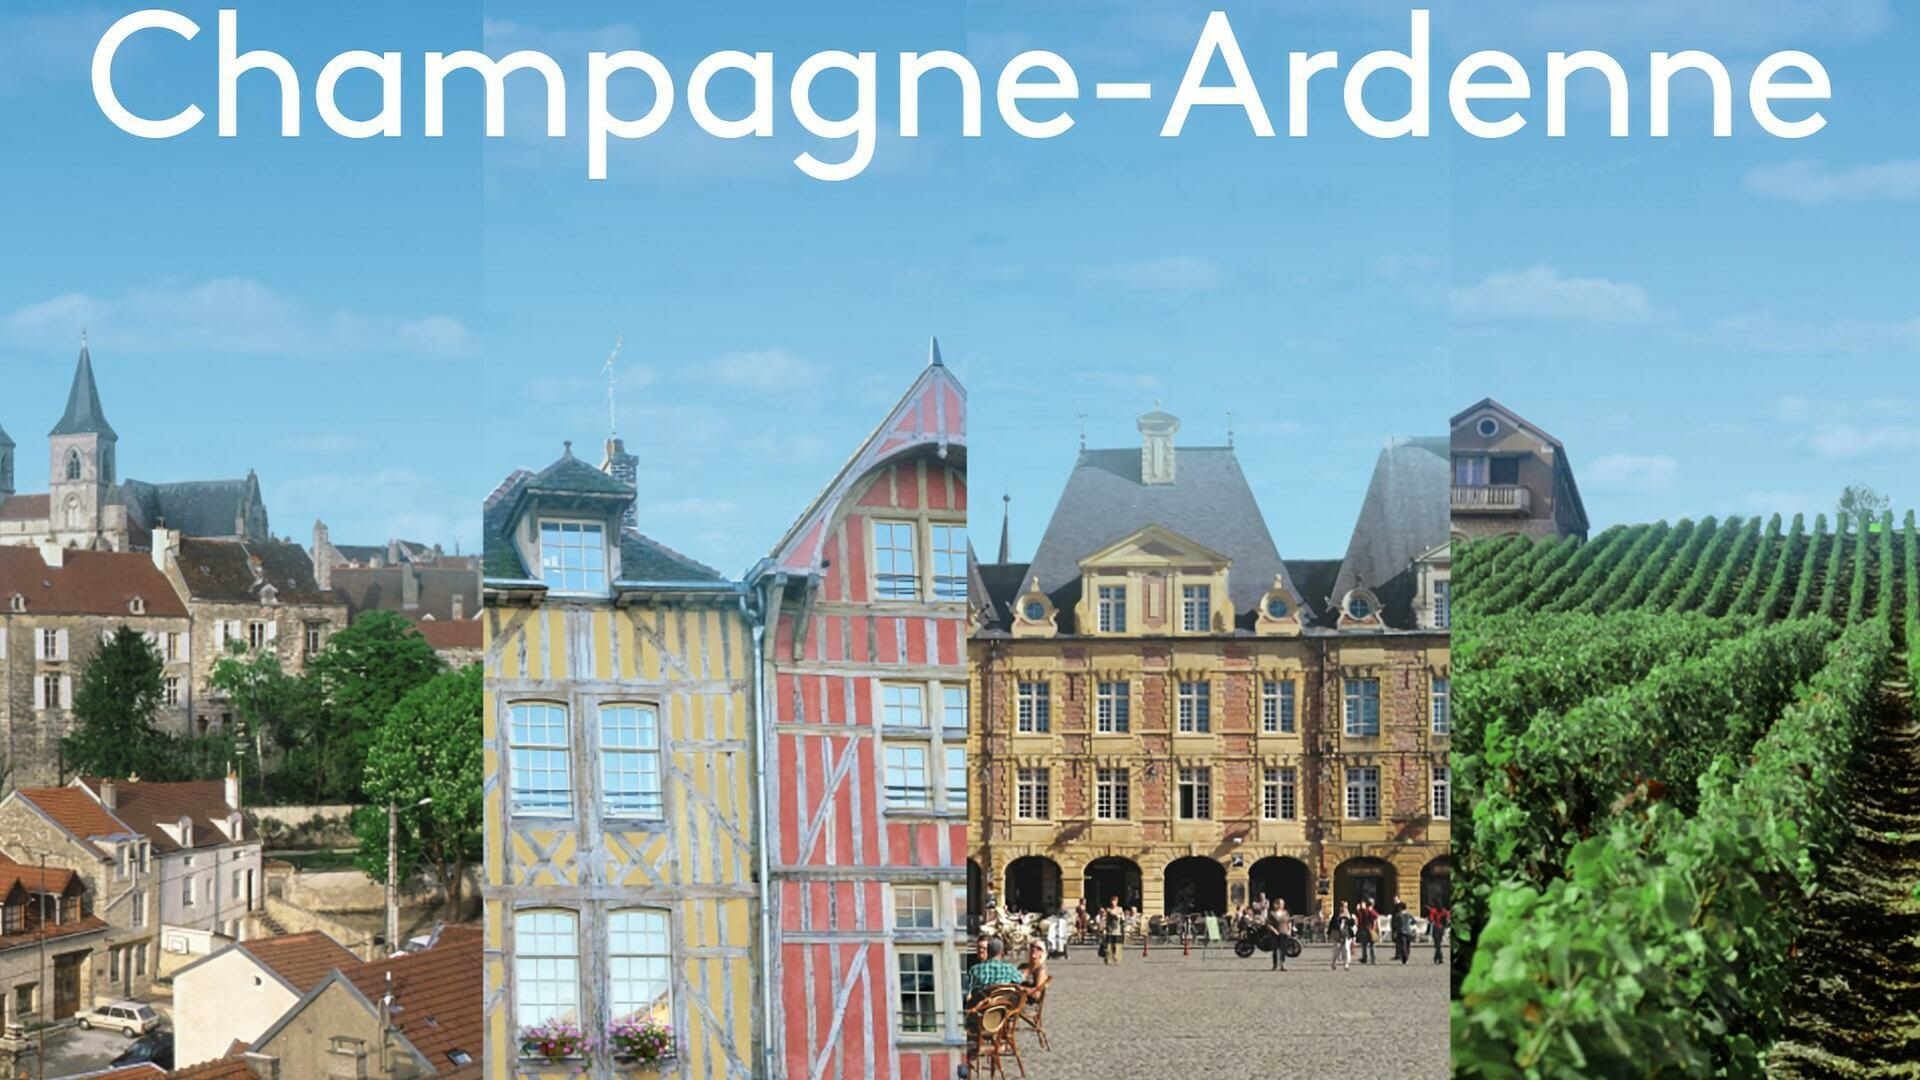 12/13 Champagne-Ardenne